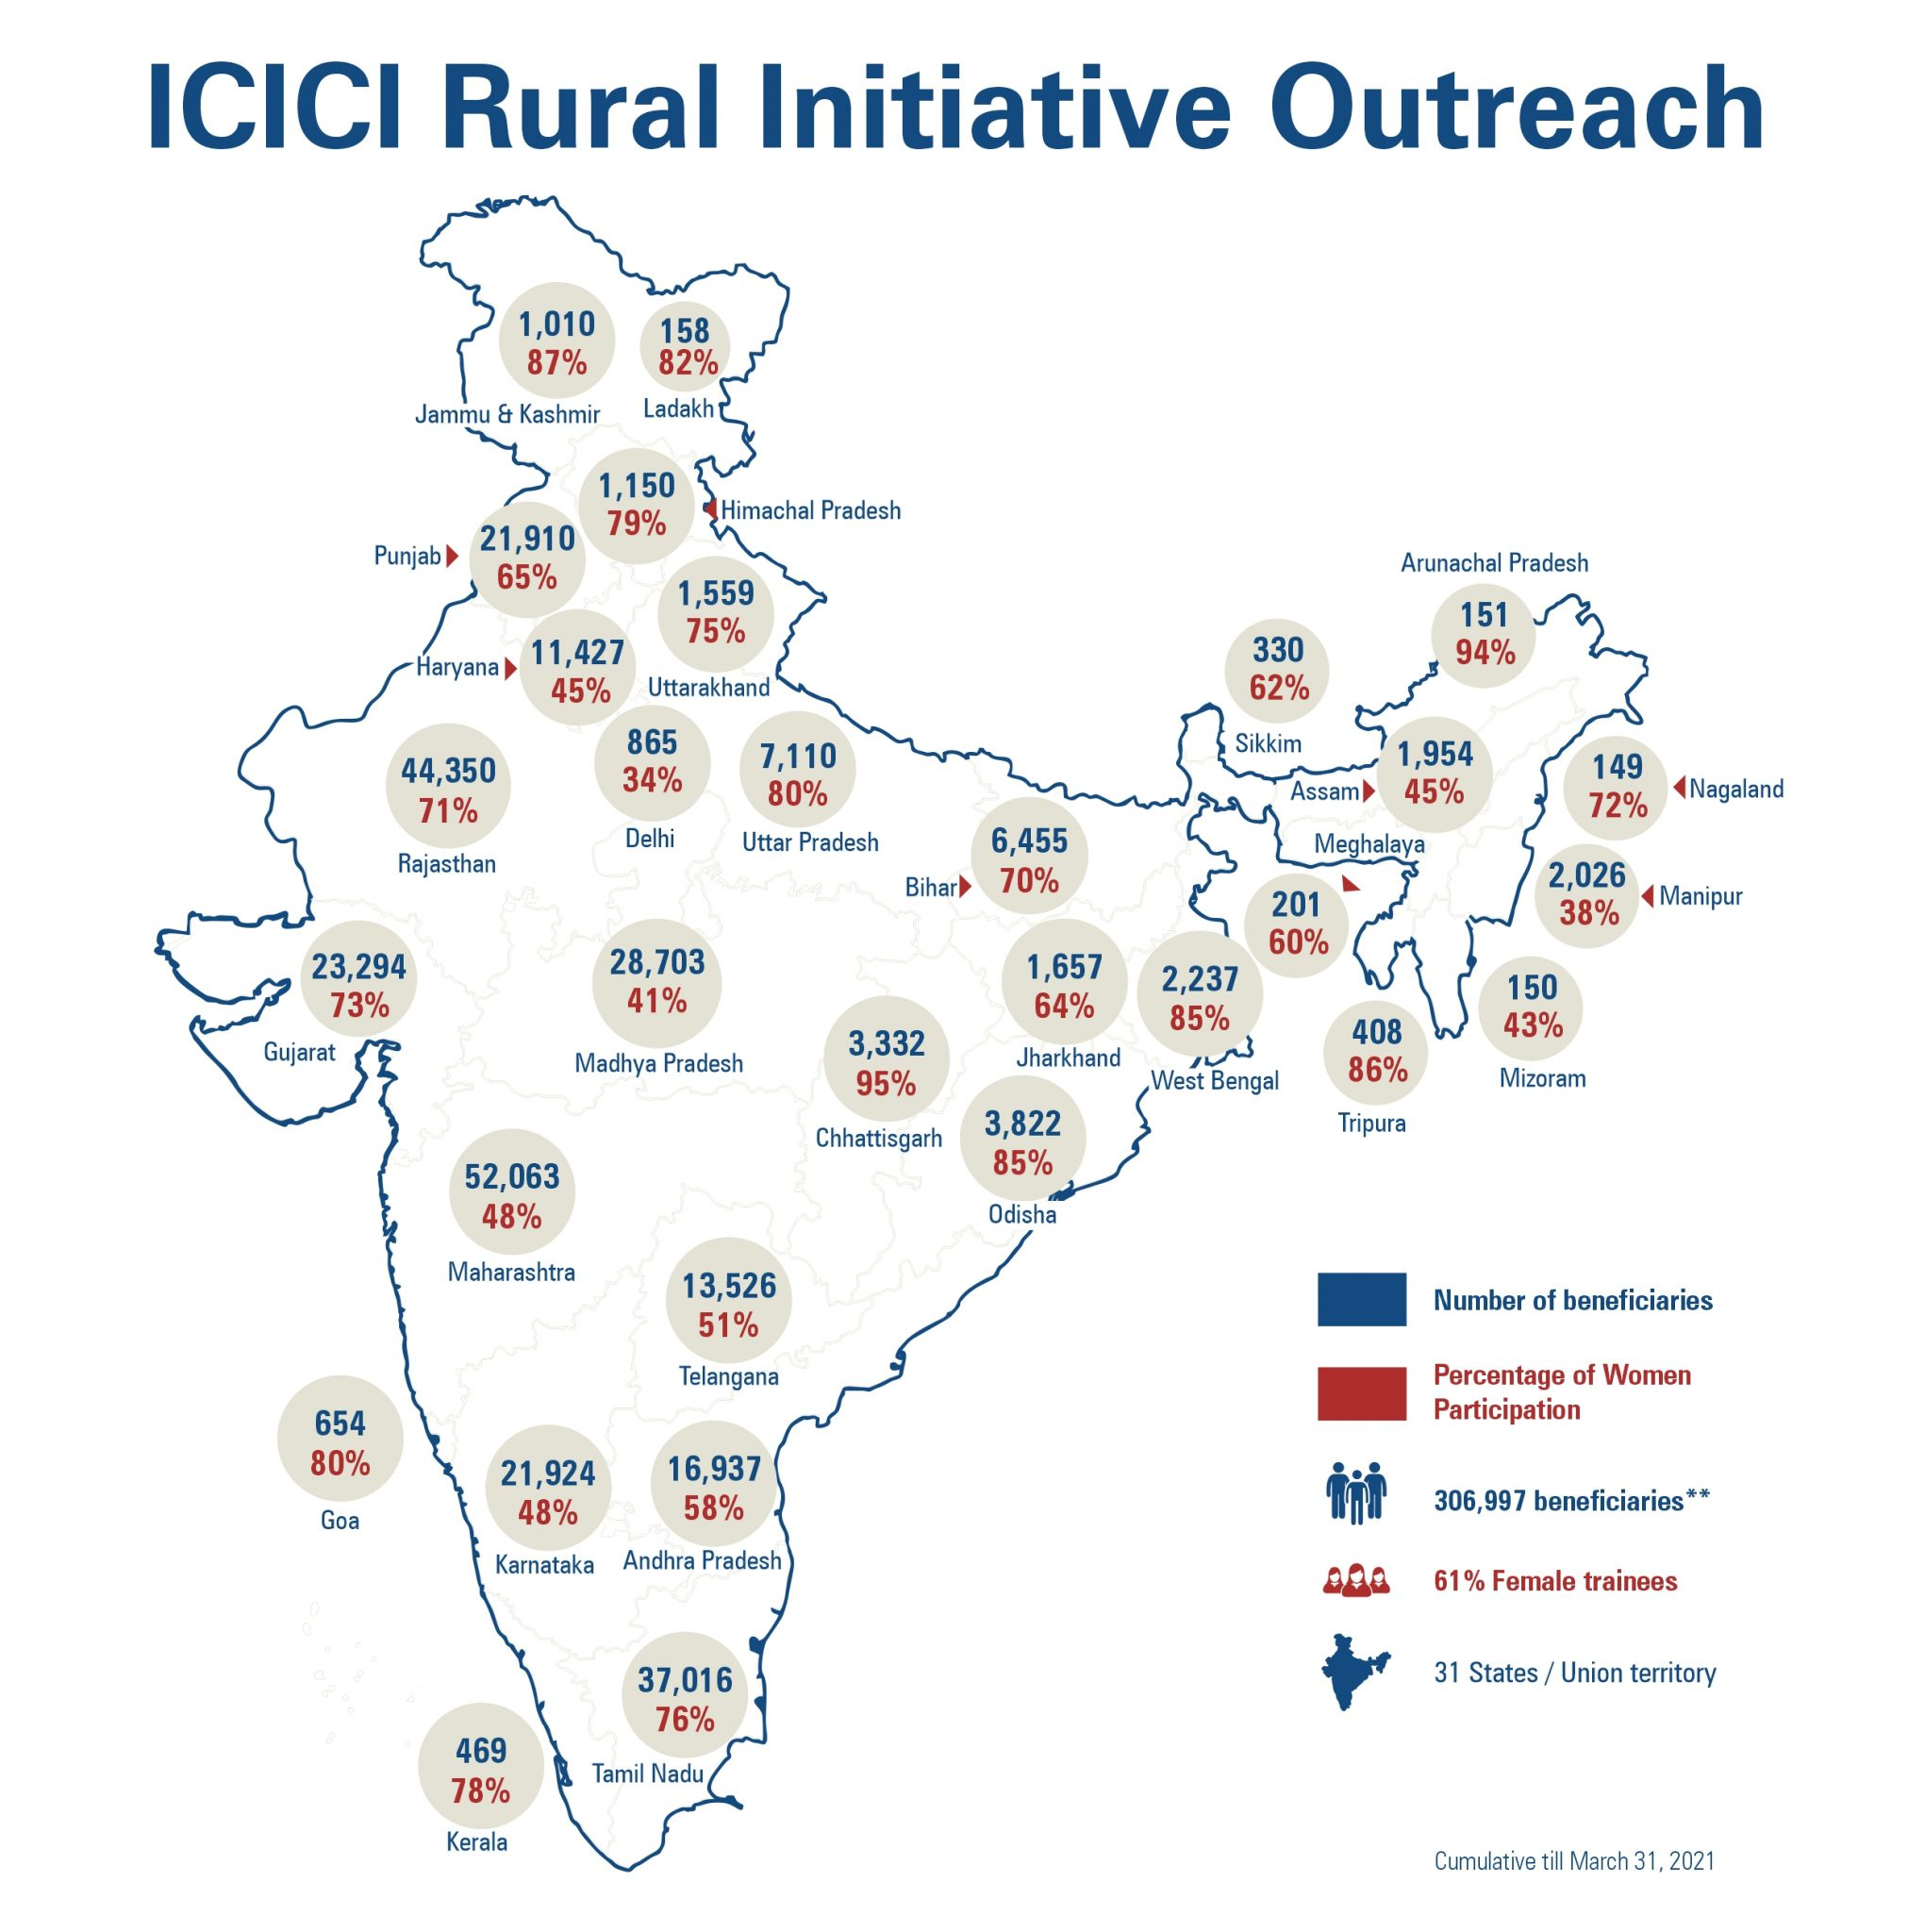 ICICI Foundation Rural Livelihood